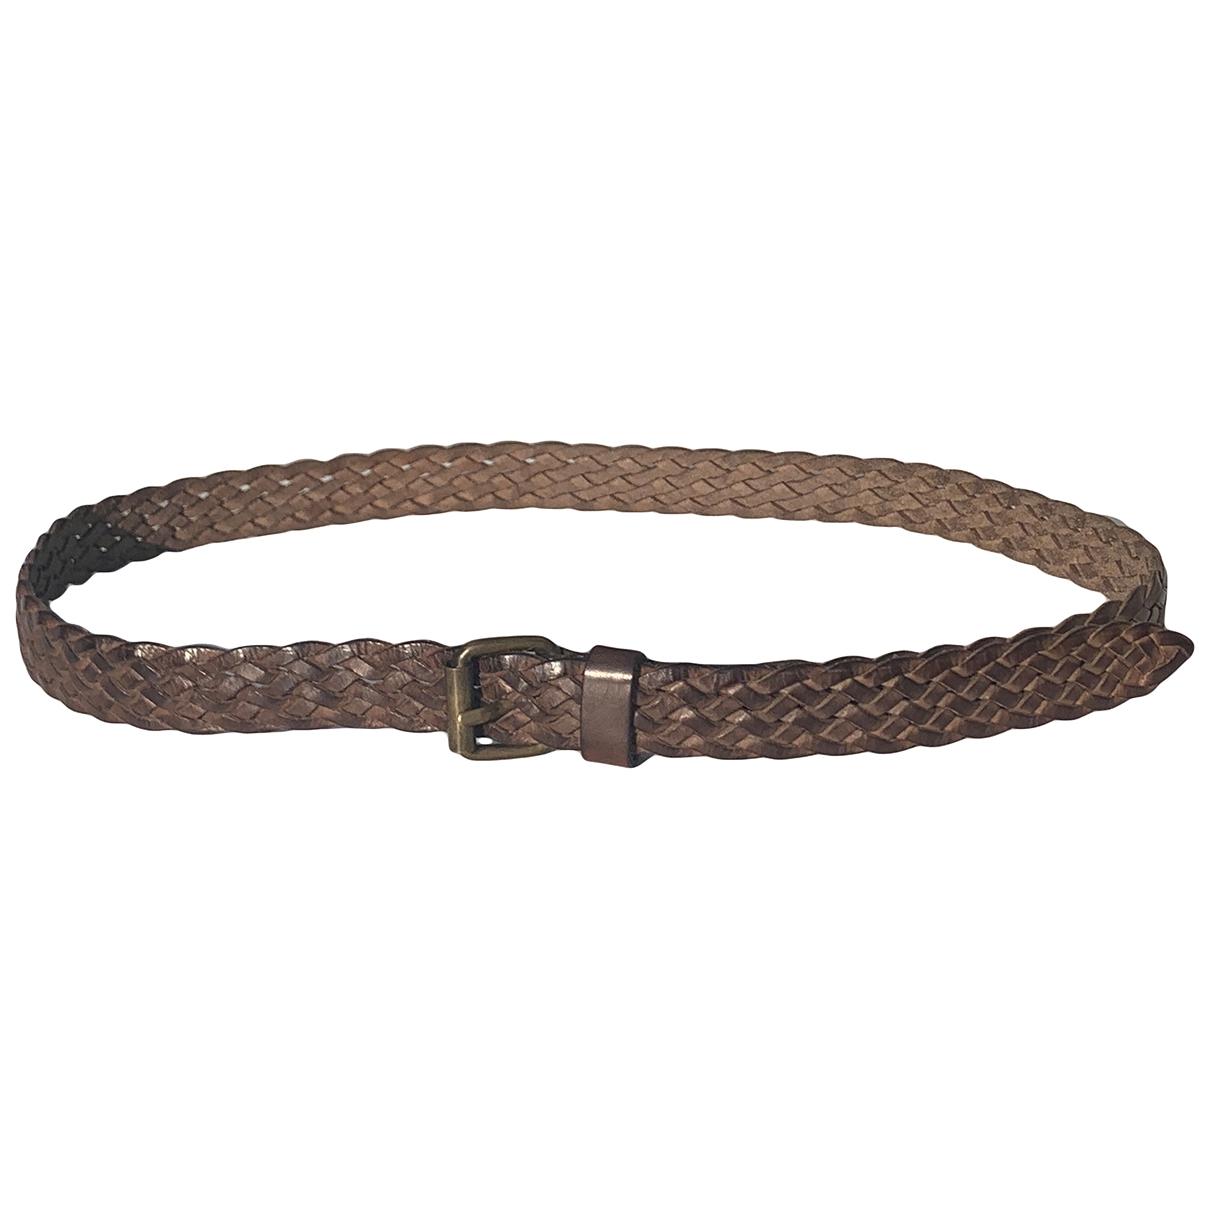 Hoss Intropia \N Brown Leather belt for Women S International